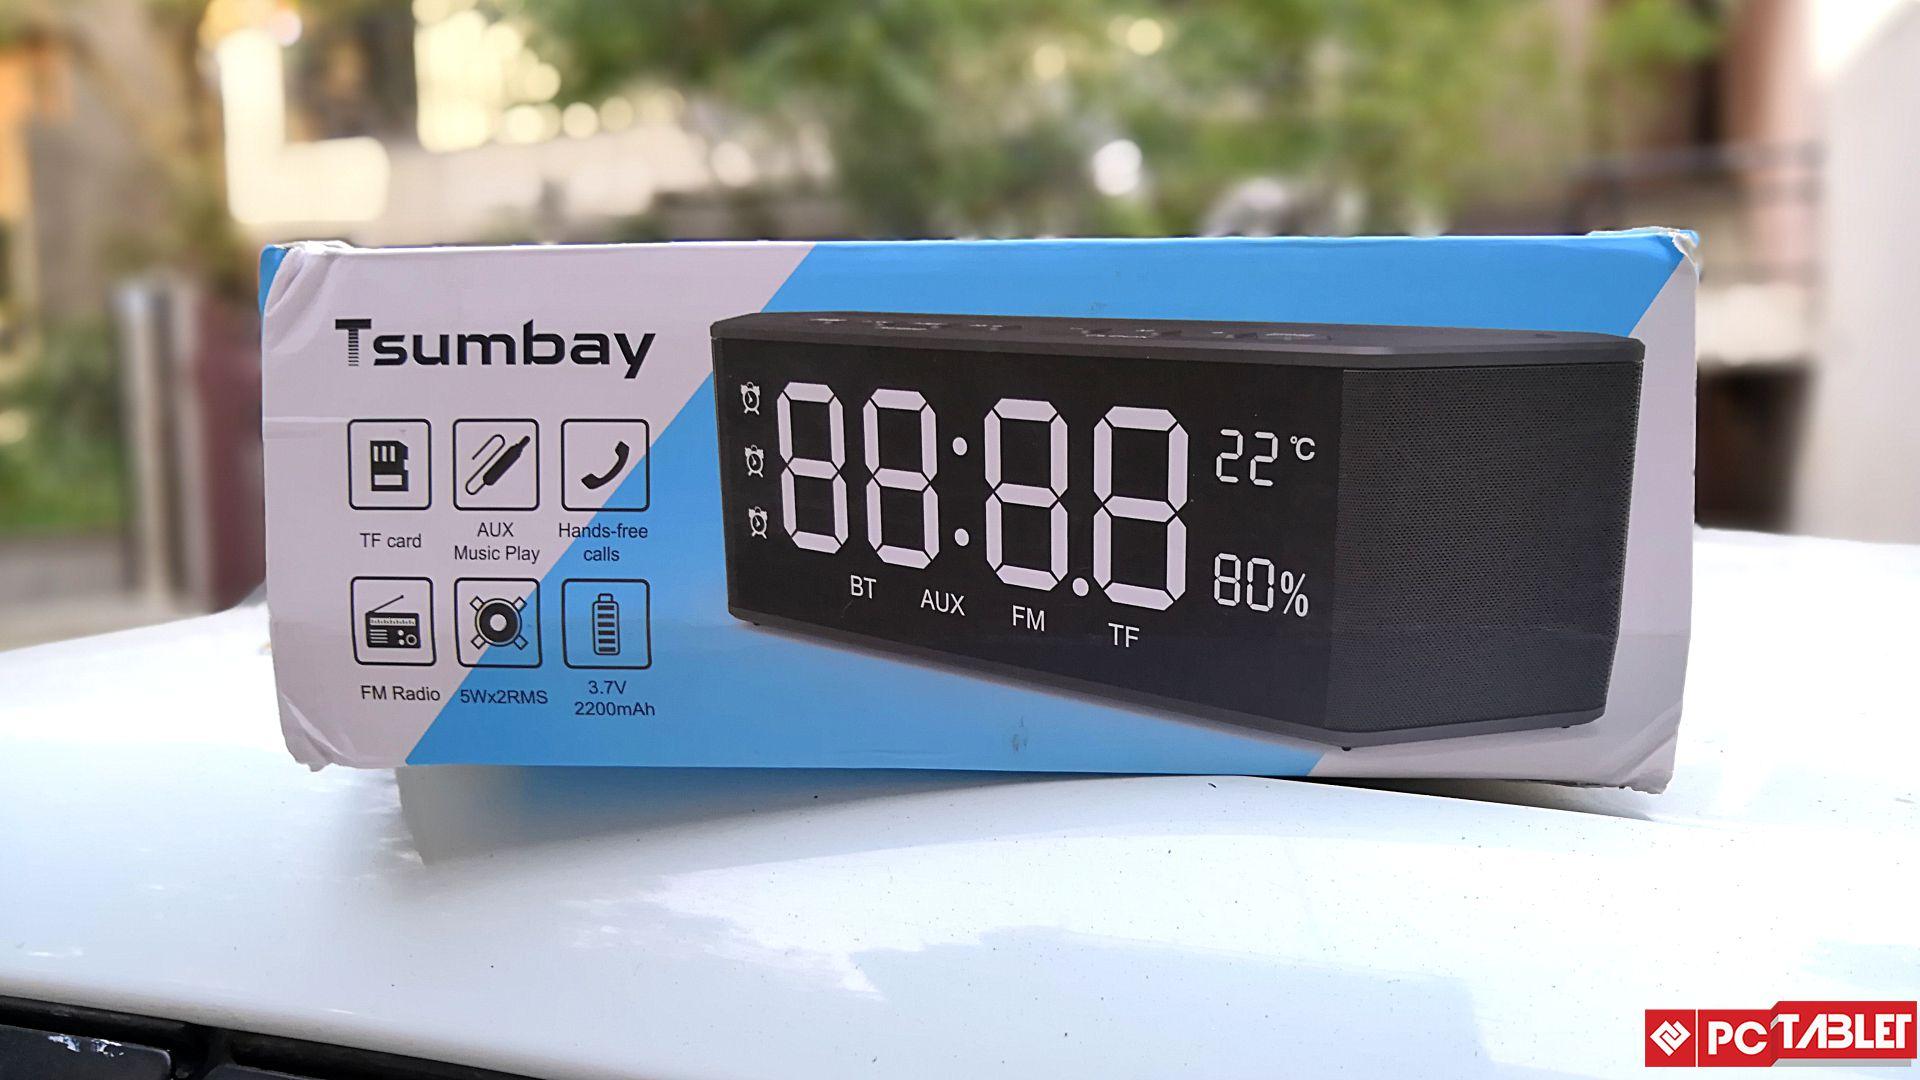 Tsumbay NX 5025 Bluetooth speaker 1